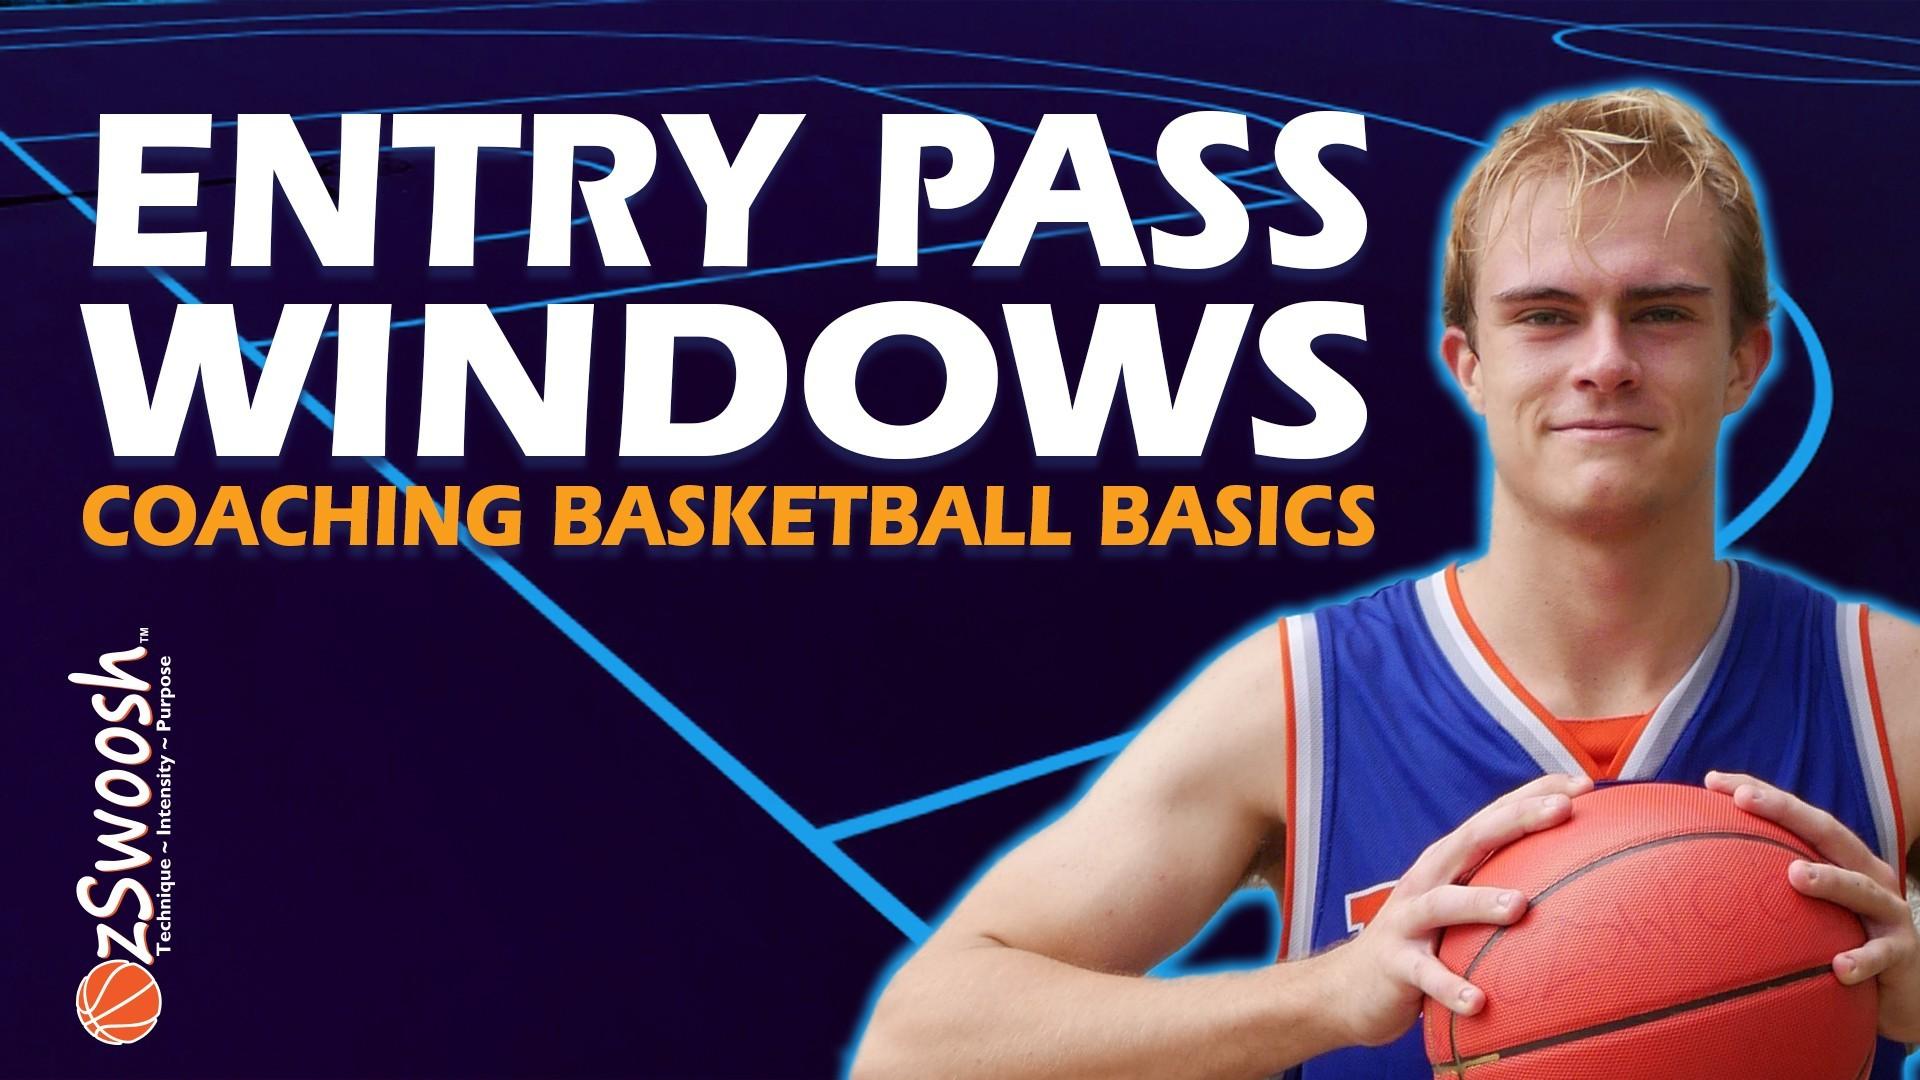 Basketball Passing Windows - Coaching Basketball Fundamentals